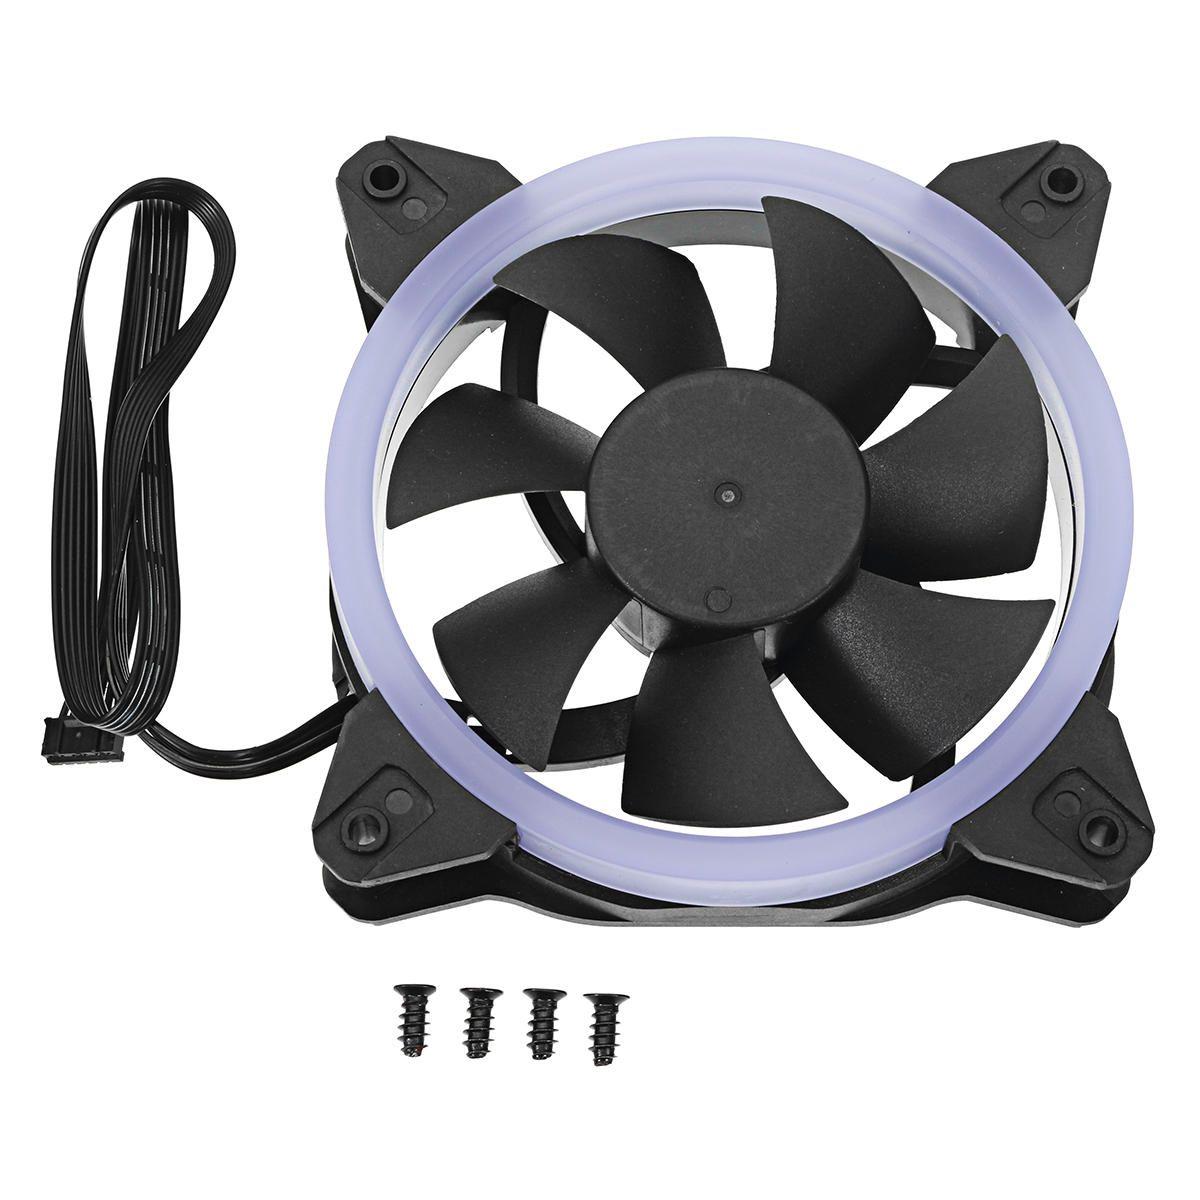 Dc 12v 120mm 3pin 4pin Rgb Led Pc Fans Sleeve Bearing Cooling Fan